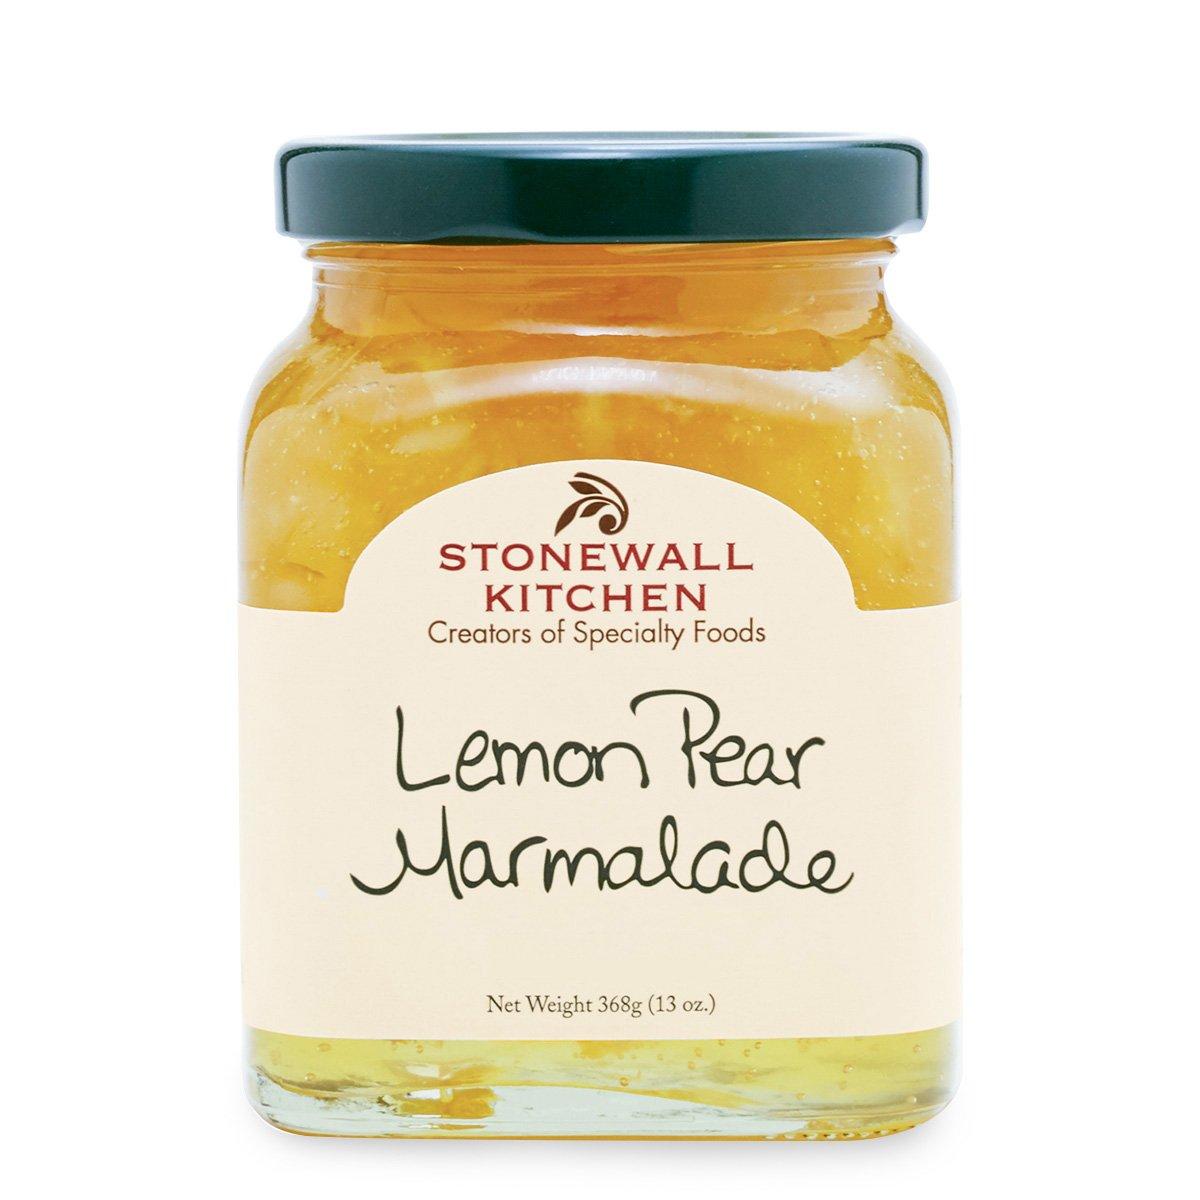 Stonewall Kitchen Lemon Pear Marmalade, 13 Ounces